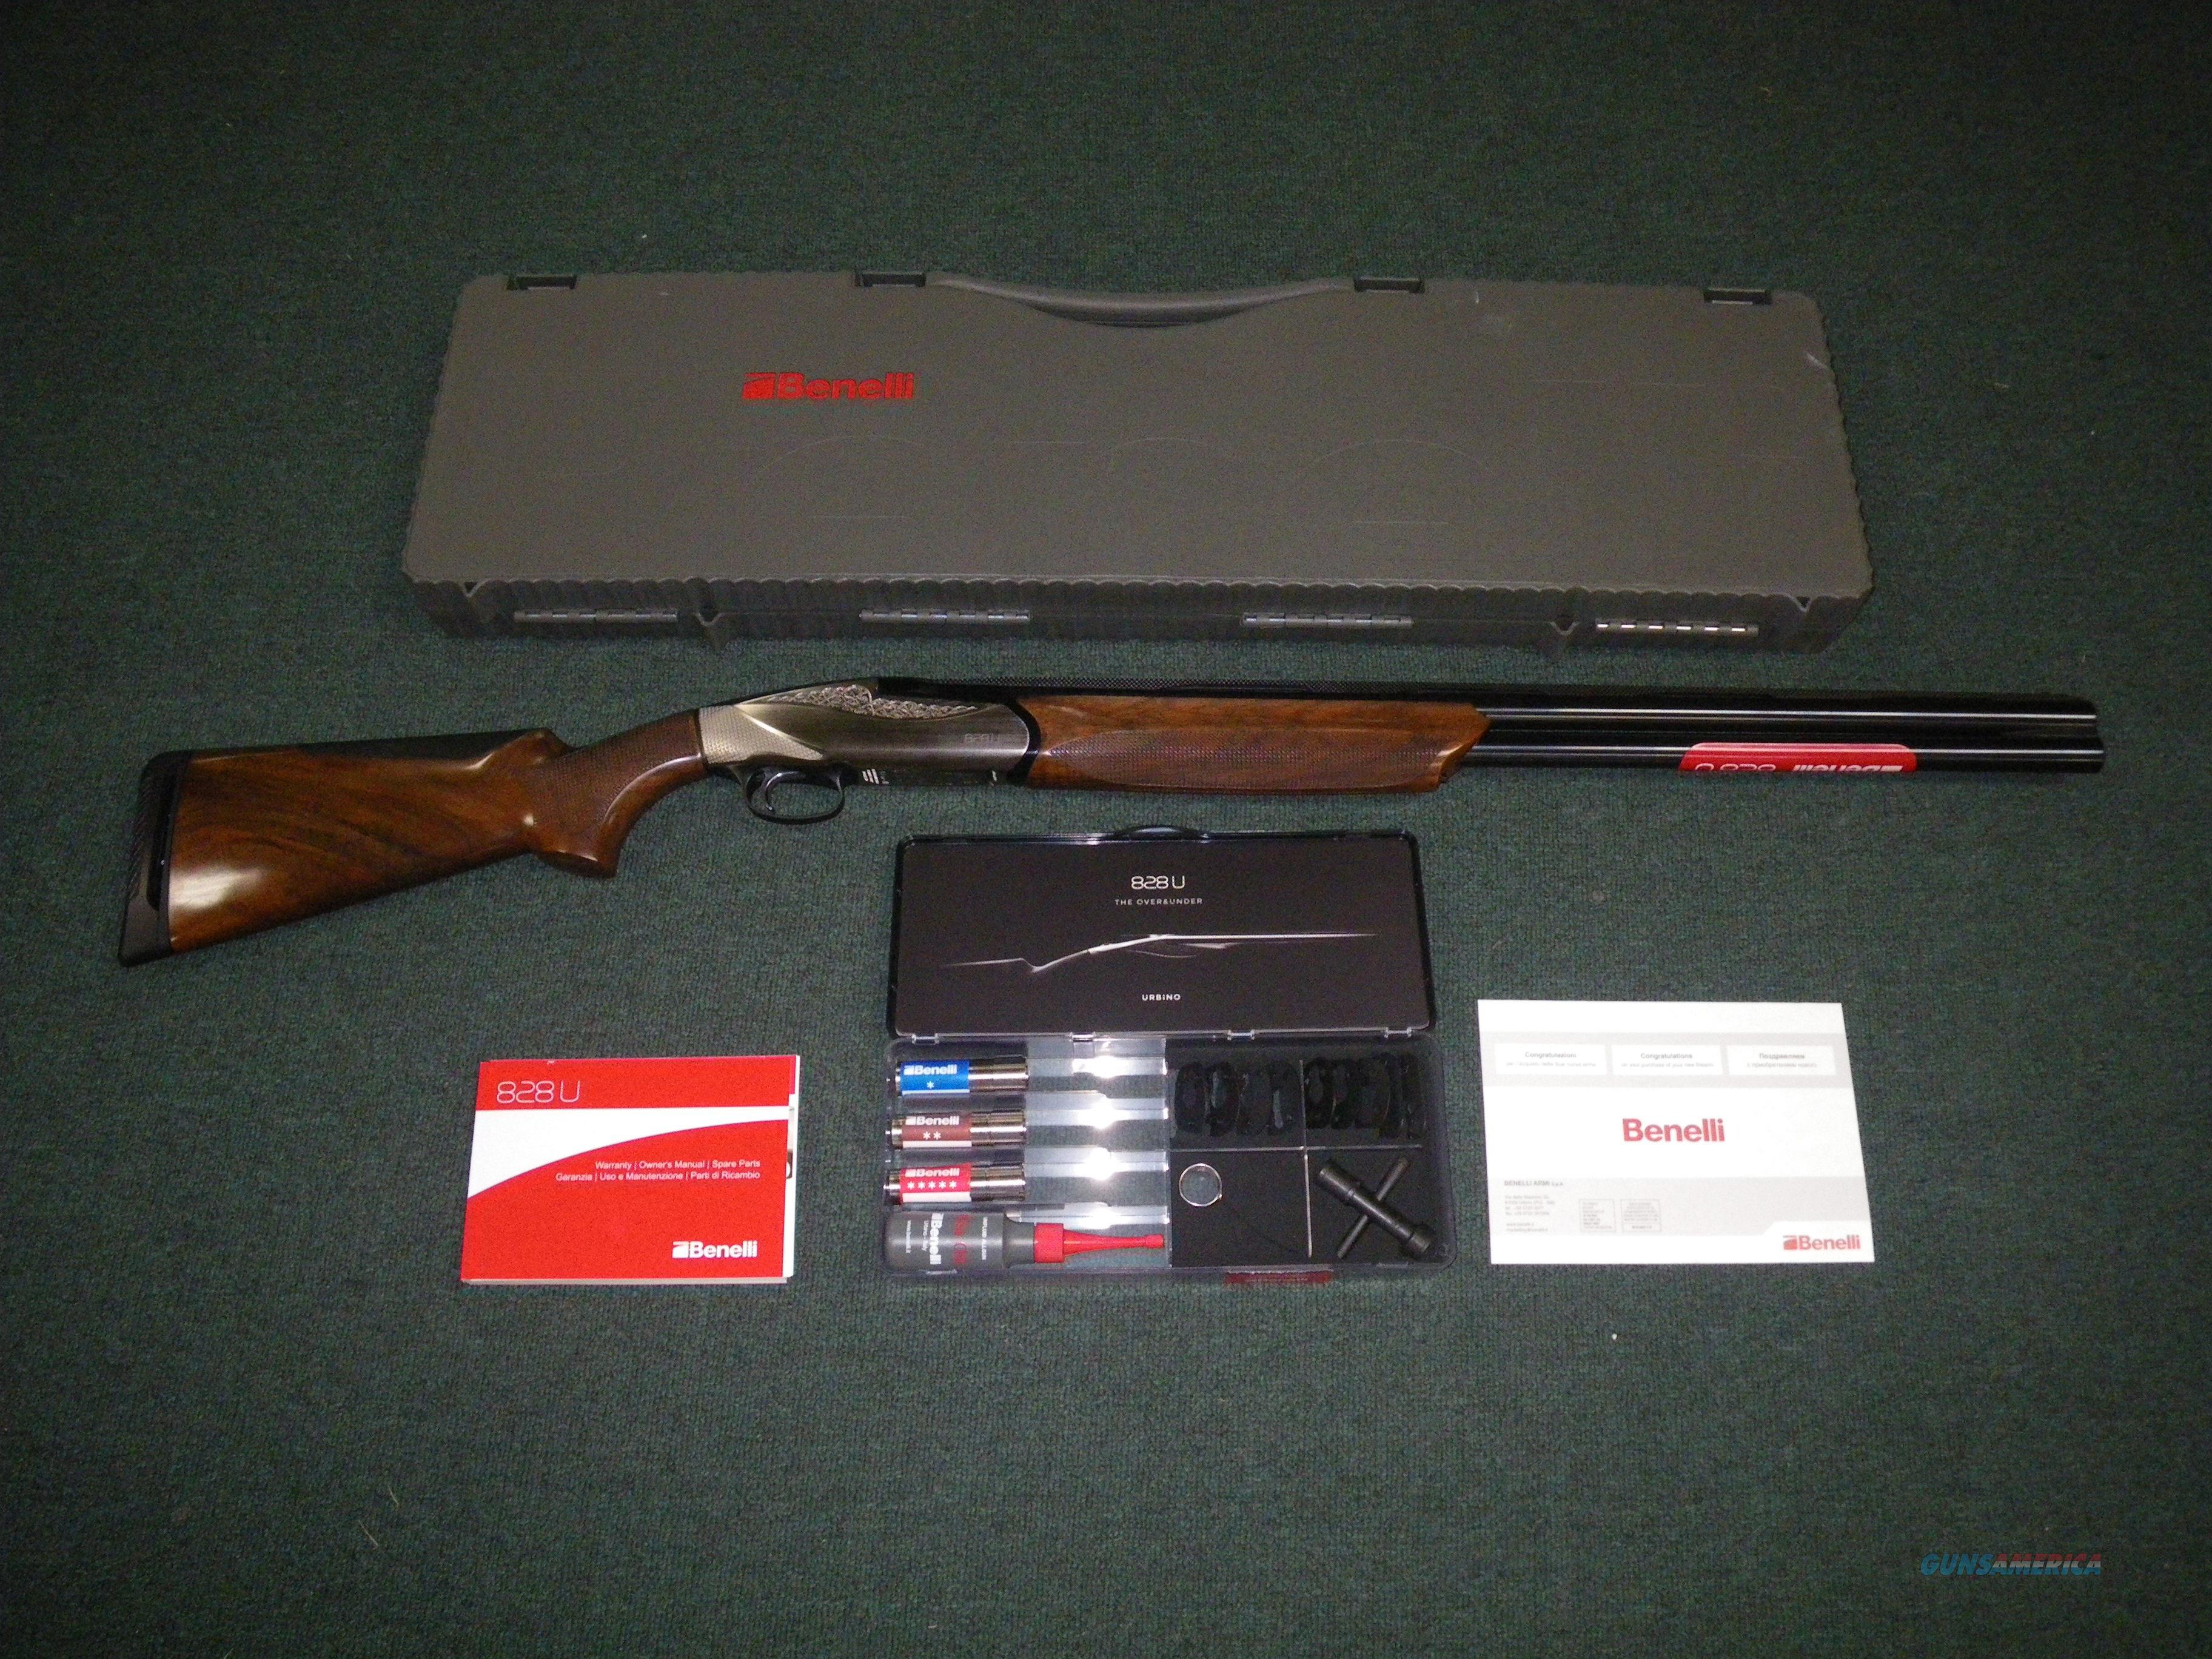 "Benelli 828U Shotgun Nickel/Wood 12ga 28"" NEW #10704  Guns > Shotguns > Benelli Shotguns > Sporting"